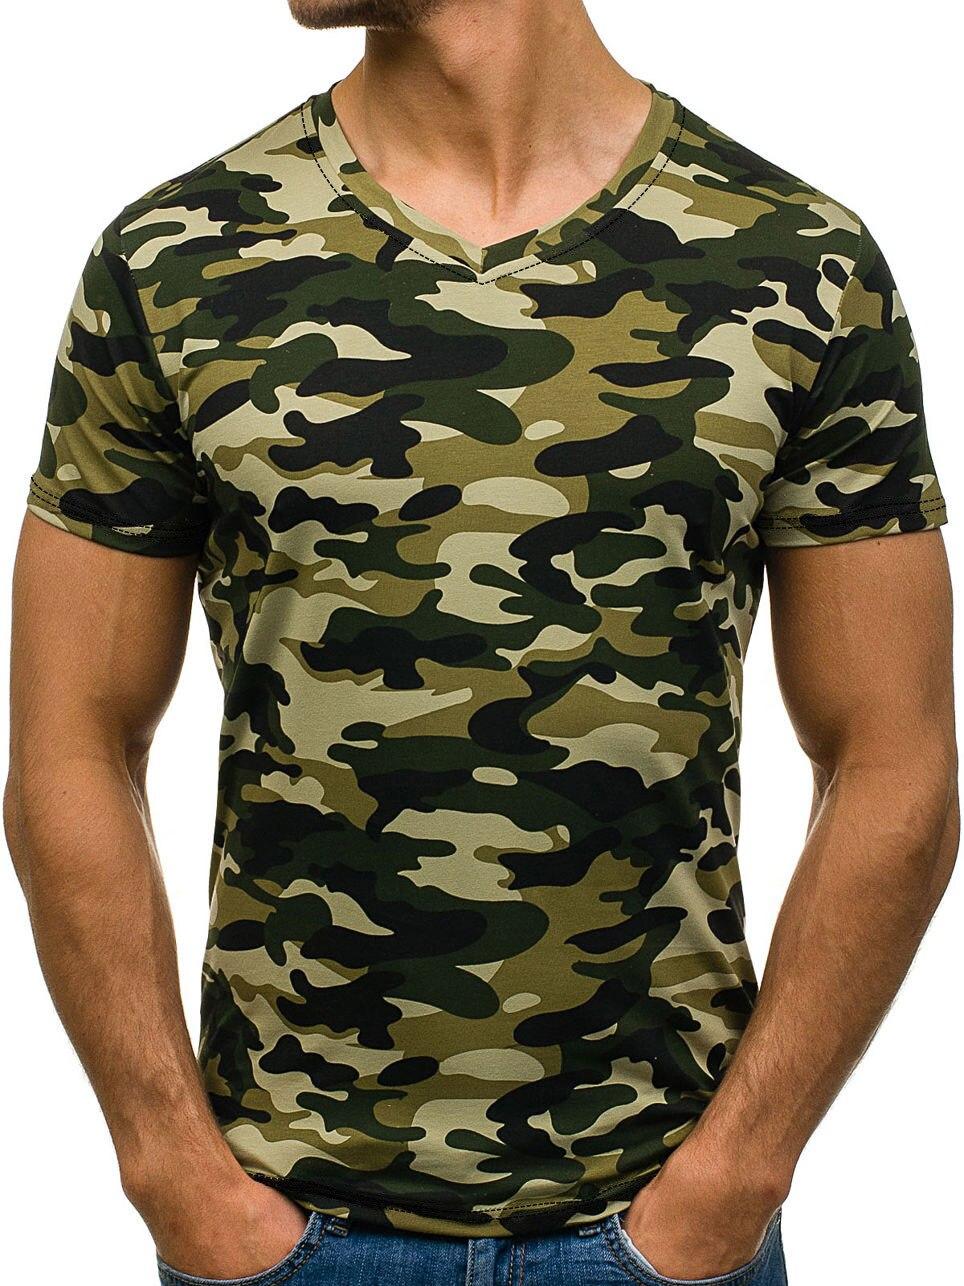 T-shirt Male, Short-sleeved T-shirt Male, Men's Short-sleeved T-shirt, Jacket Male, Men's Clothing Streetwear  Men T Shirt